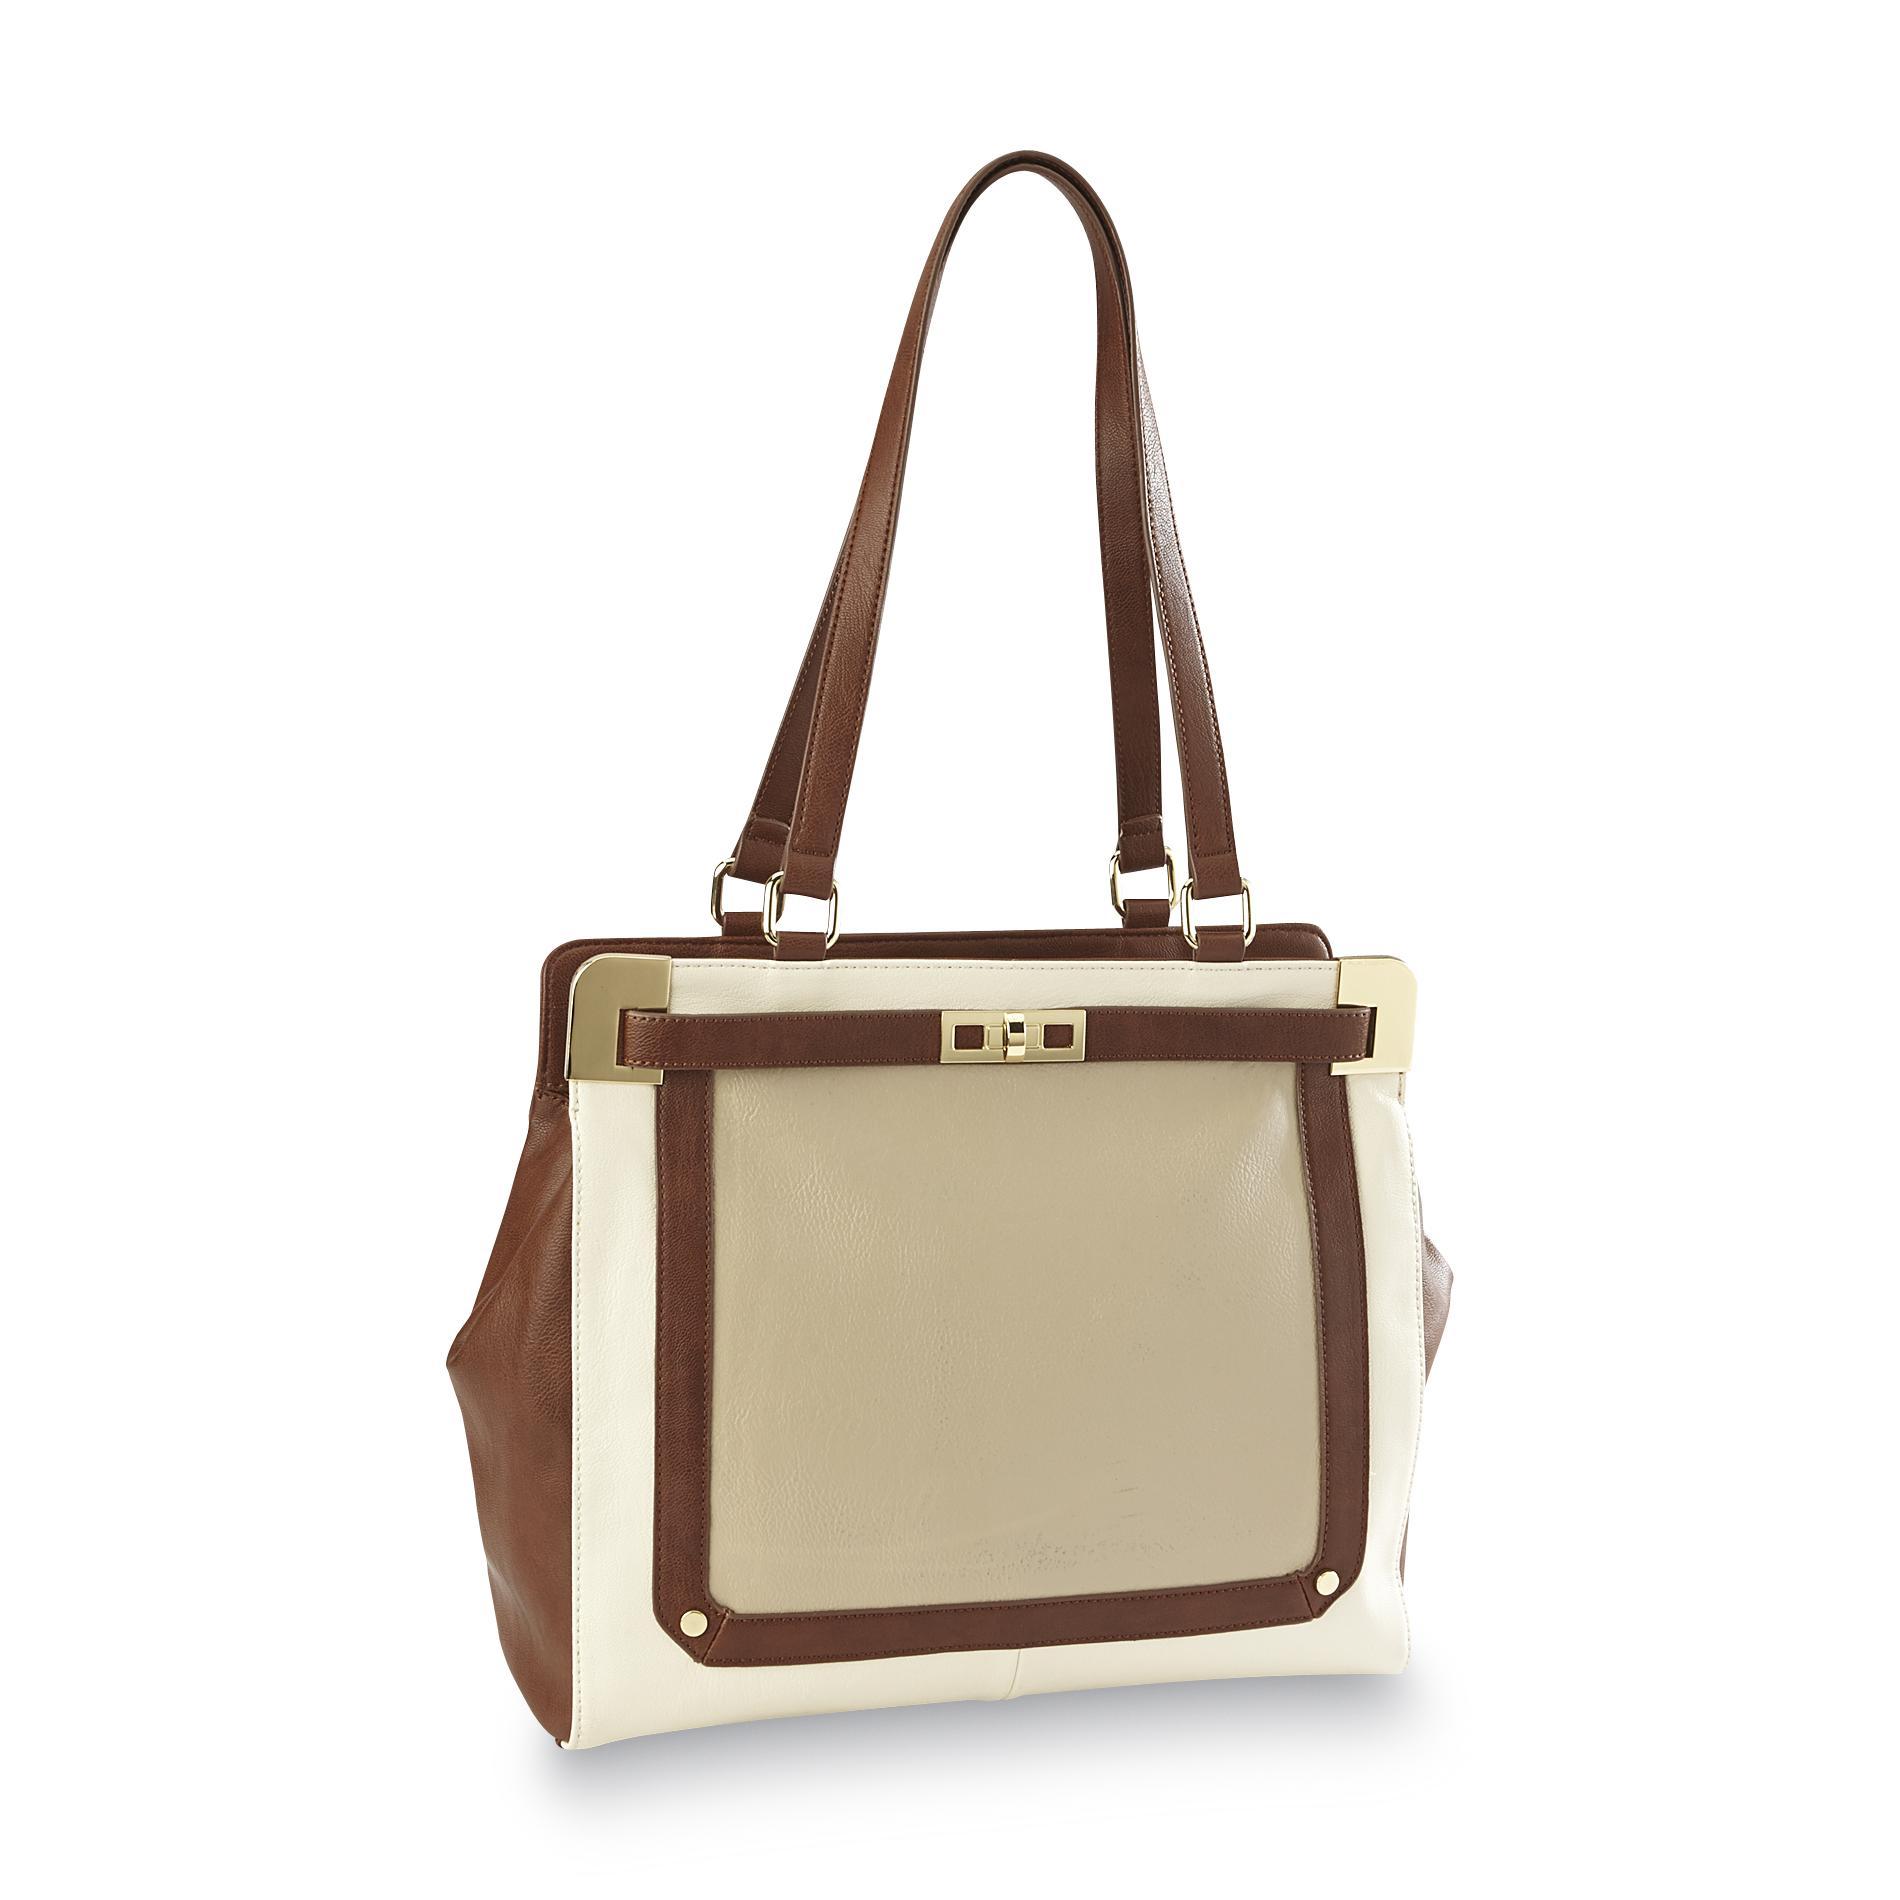 Jaclyn Smith Women's Carolina Satchel Handbag - Colorblock